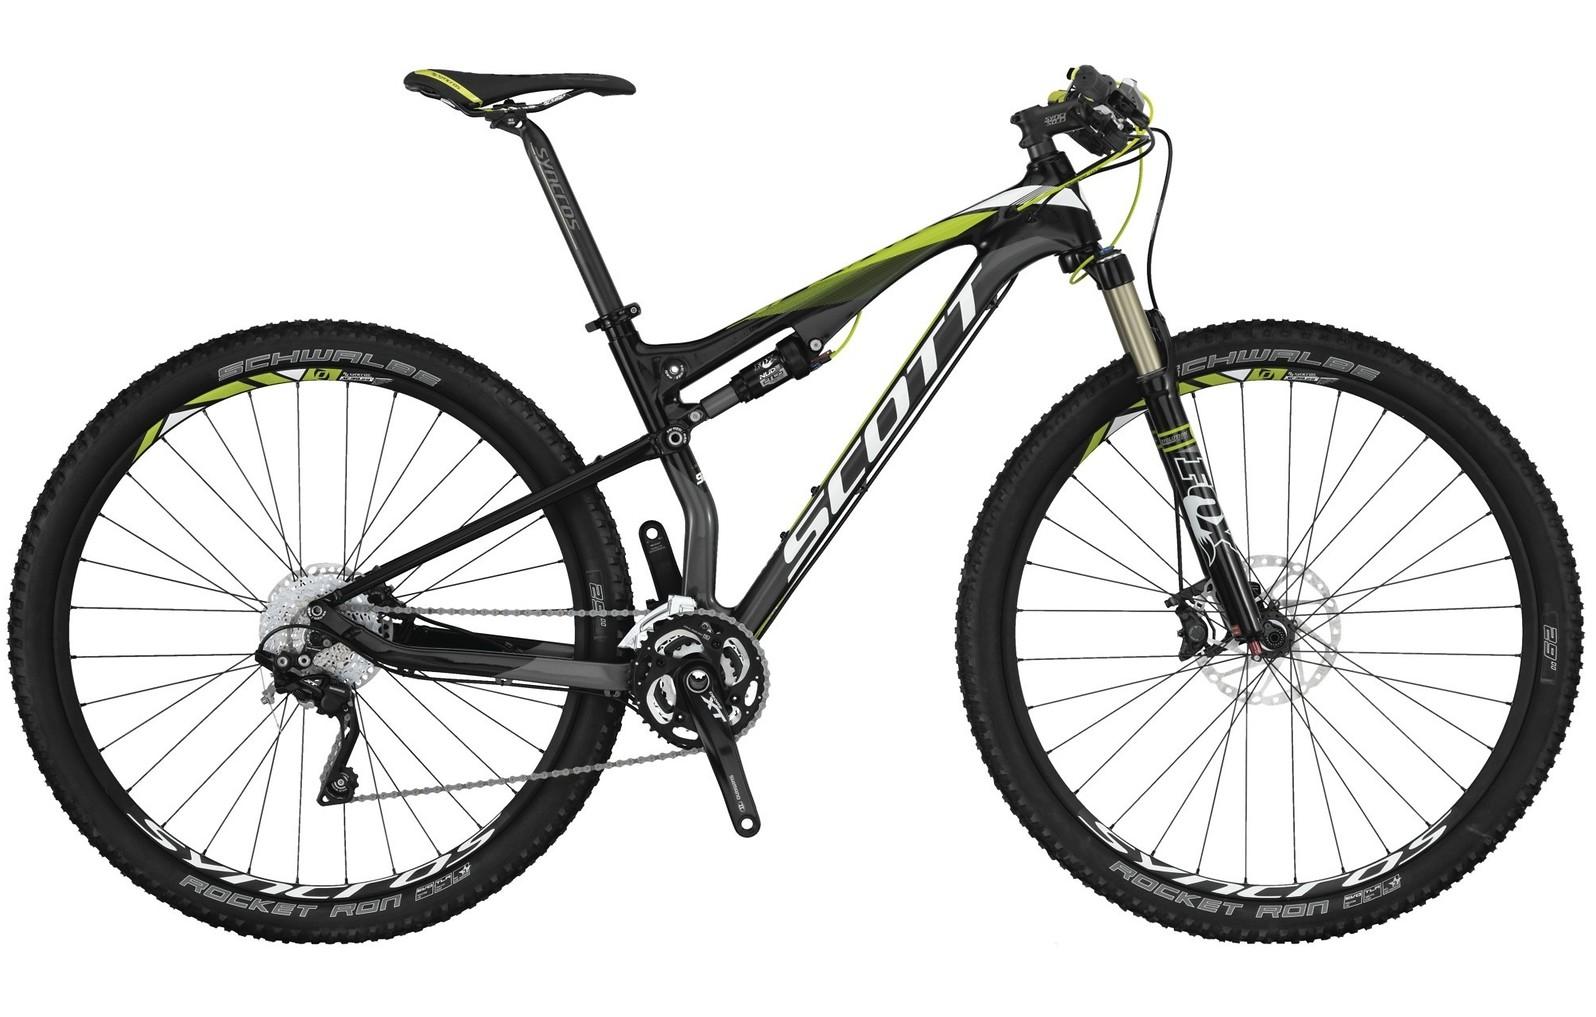 SCOTT Spark 920 Bike